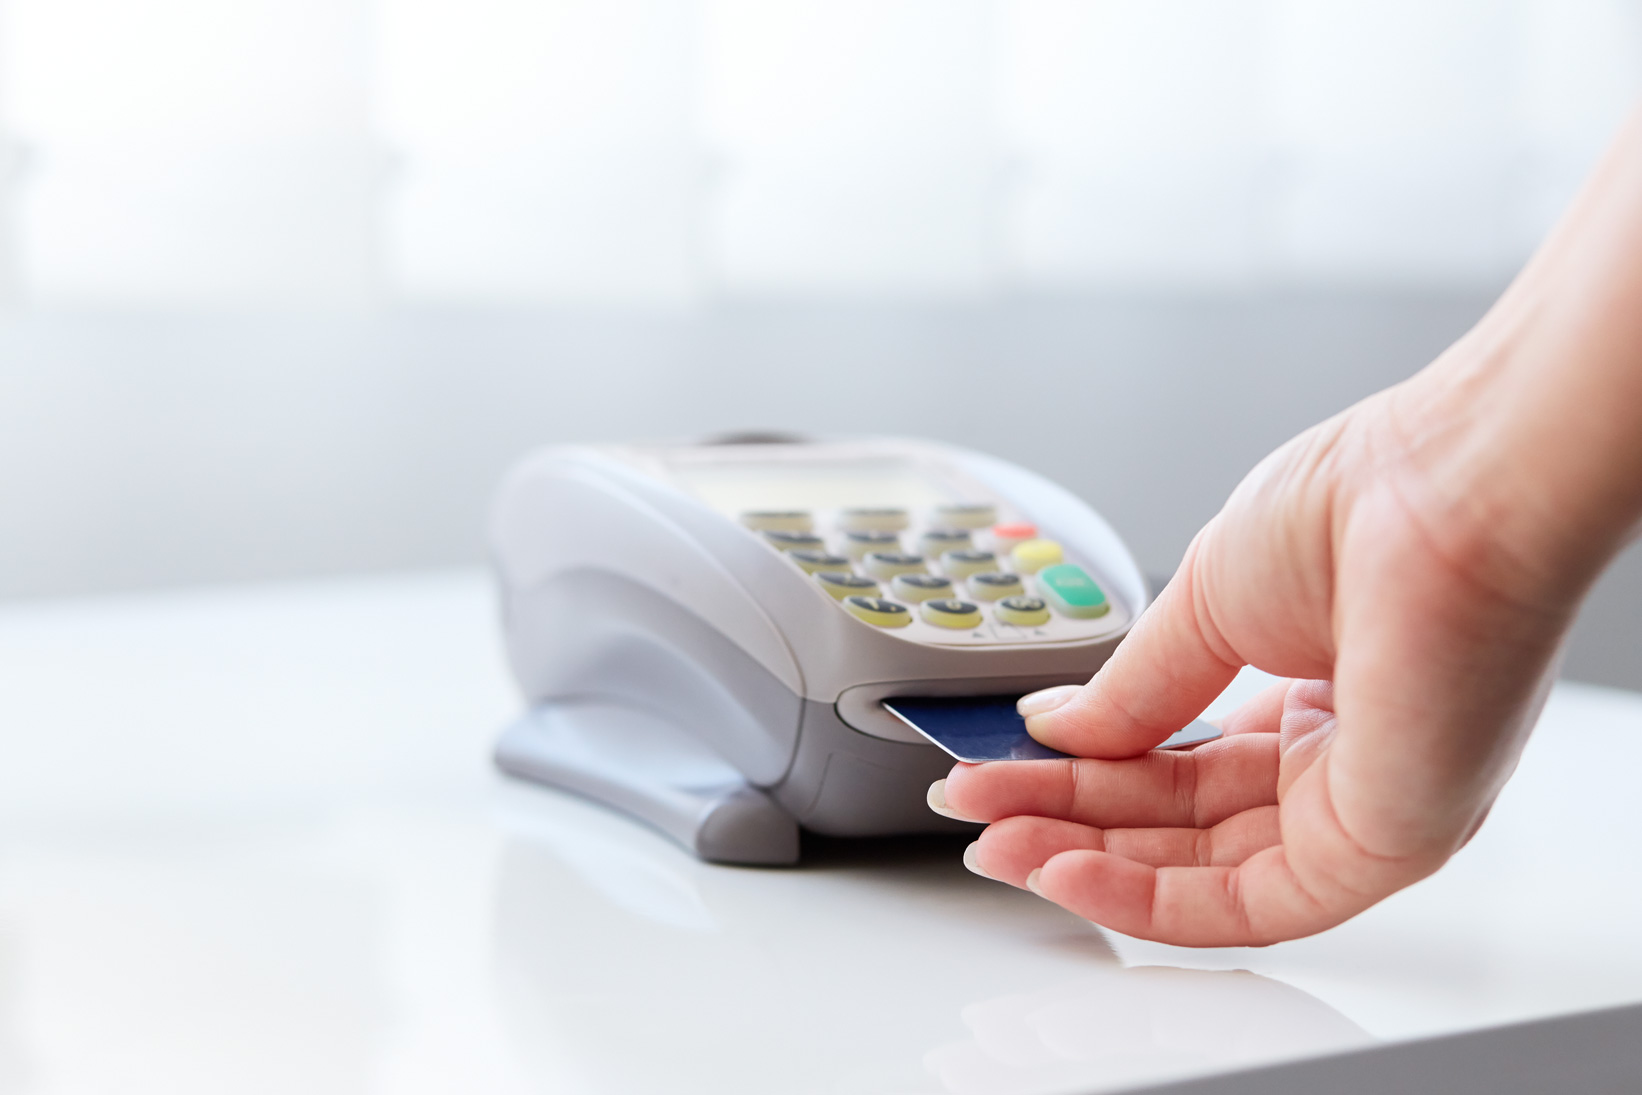 The debit card